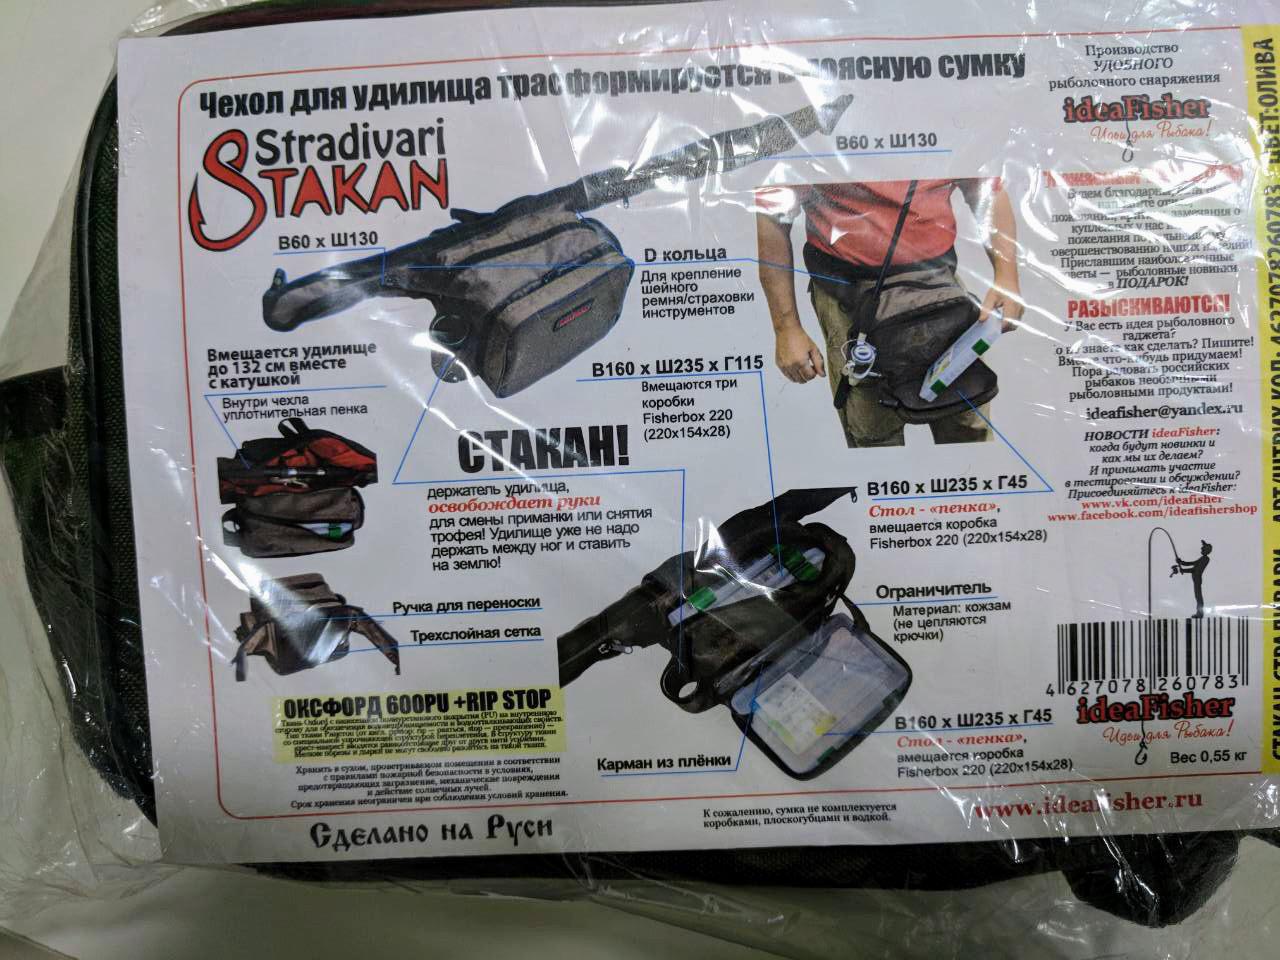 Stakan Stradivari поясная сумка с чехлом для удилища ideaFisher ...